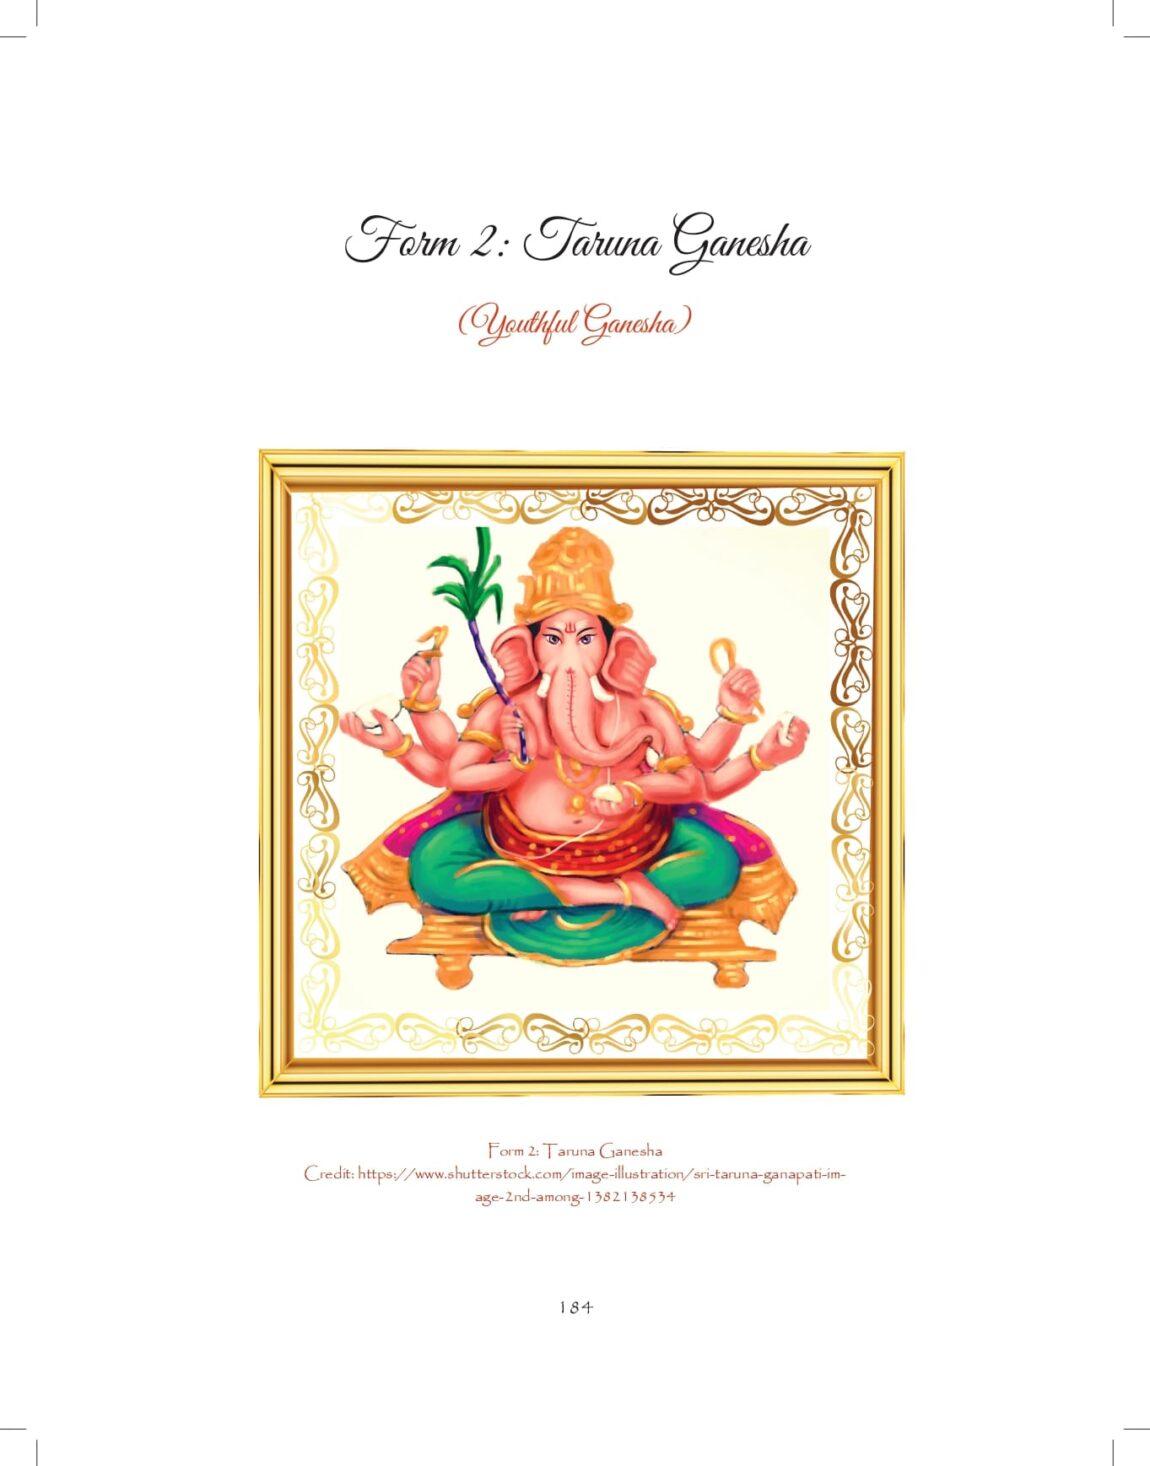 Ganesh-print_pages-to-jpg-0184.jpg